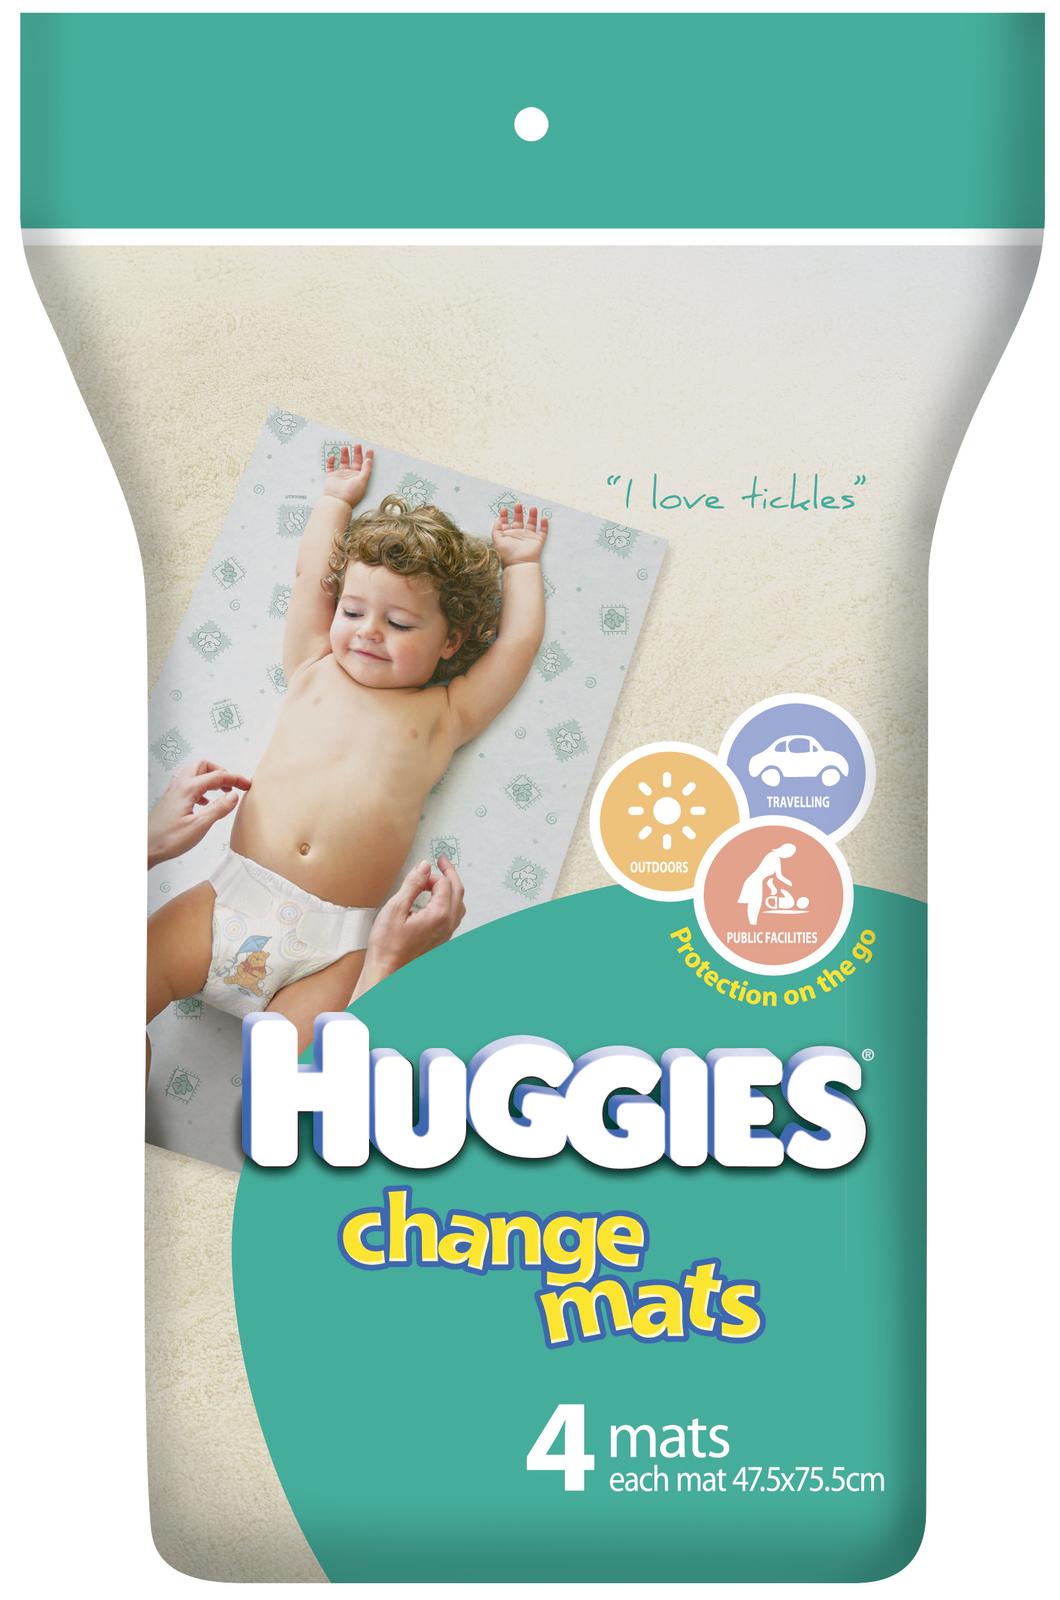 Huggies Baby Change Mats - 4 Pack image